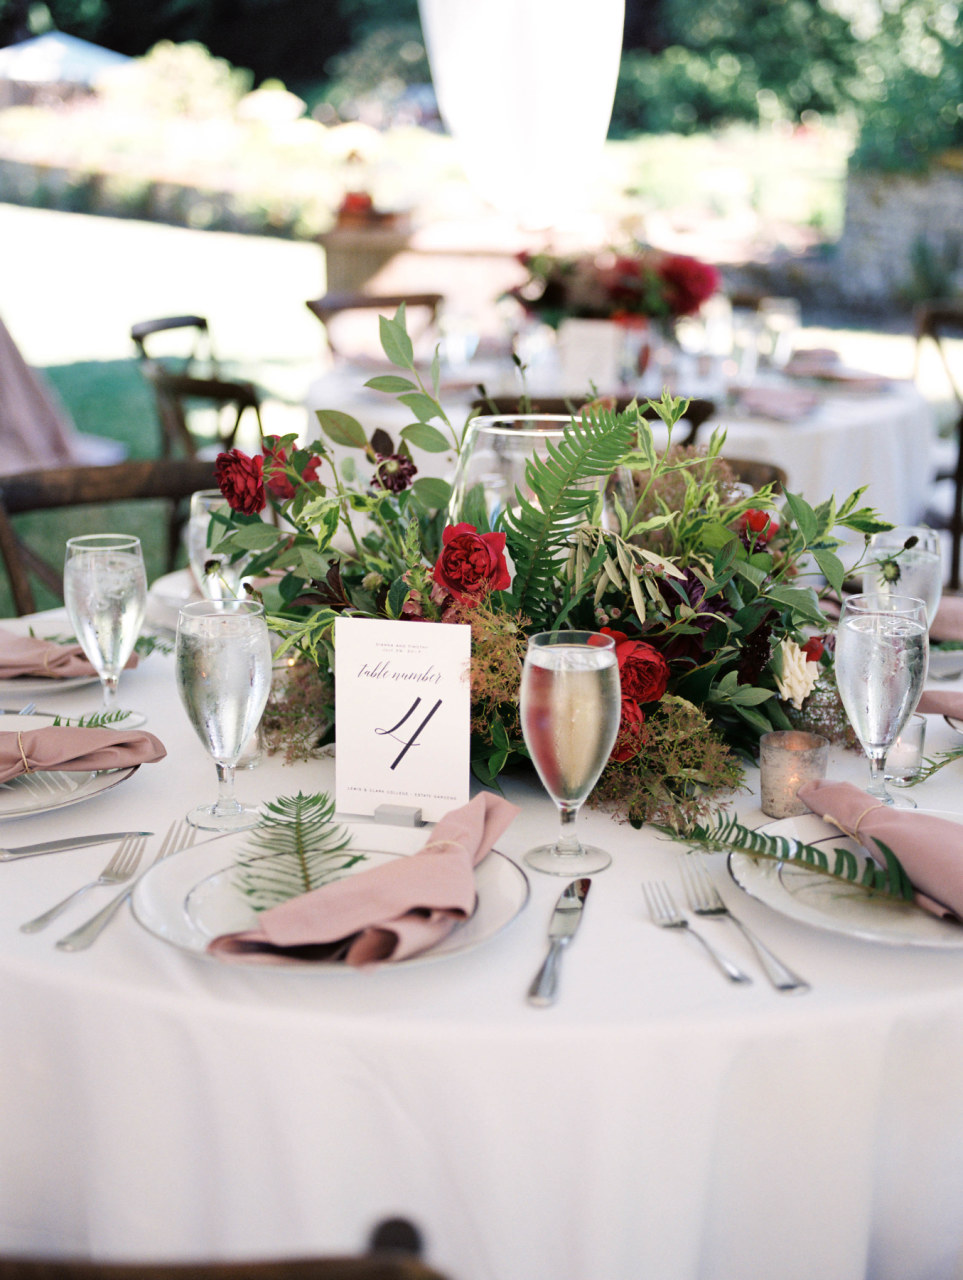 fine-art-wedding-florist-foraged-floral-lewis-and-clark-college-wedding-flower-centerpiece-with-red-flowers.jpg